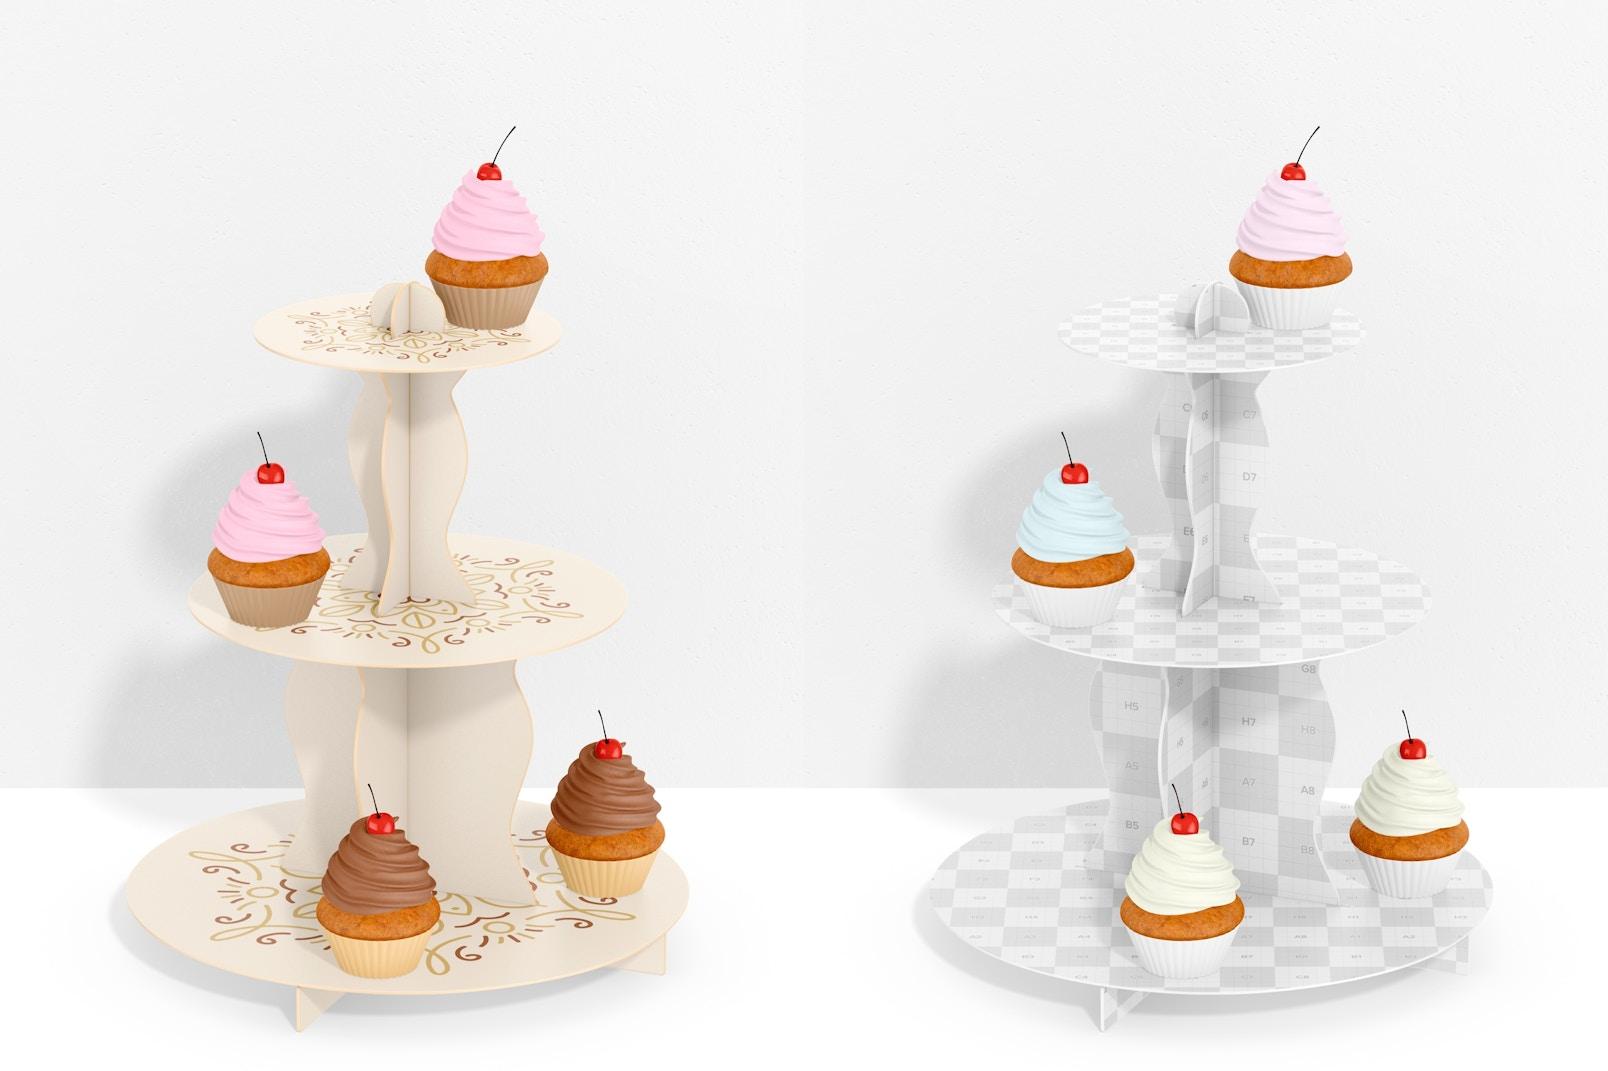 3-Tier Cardboard Cupcake Stand with Wall Mockup